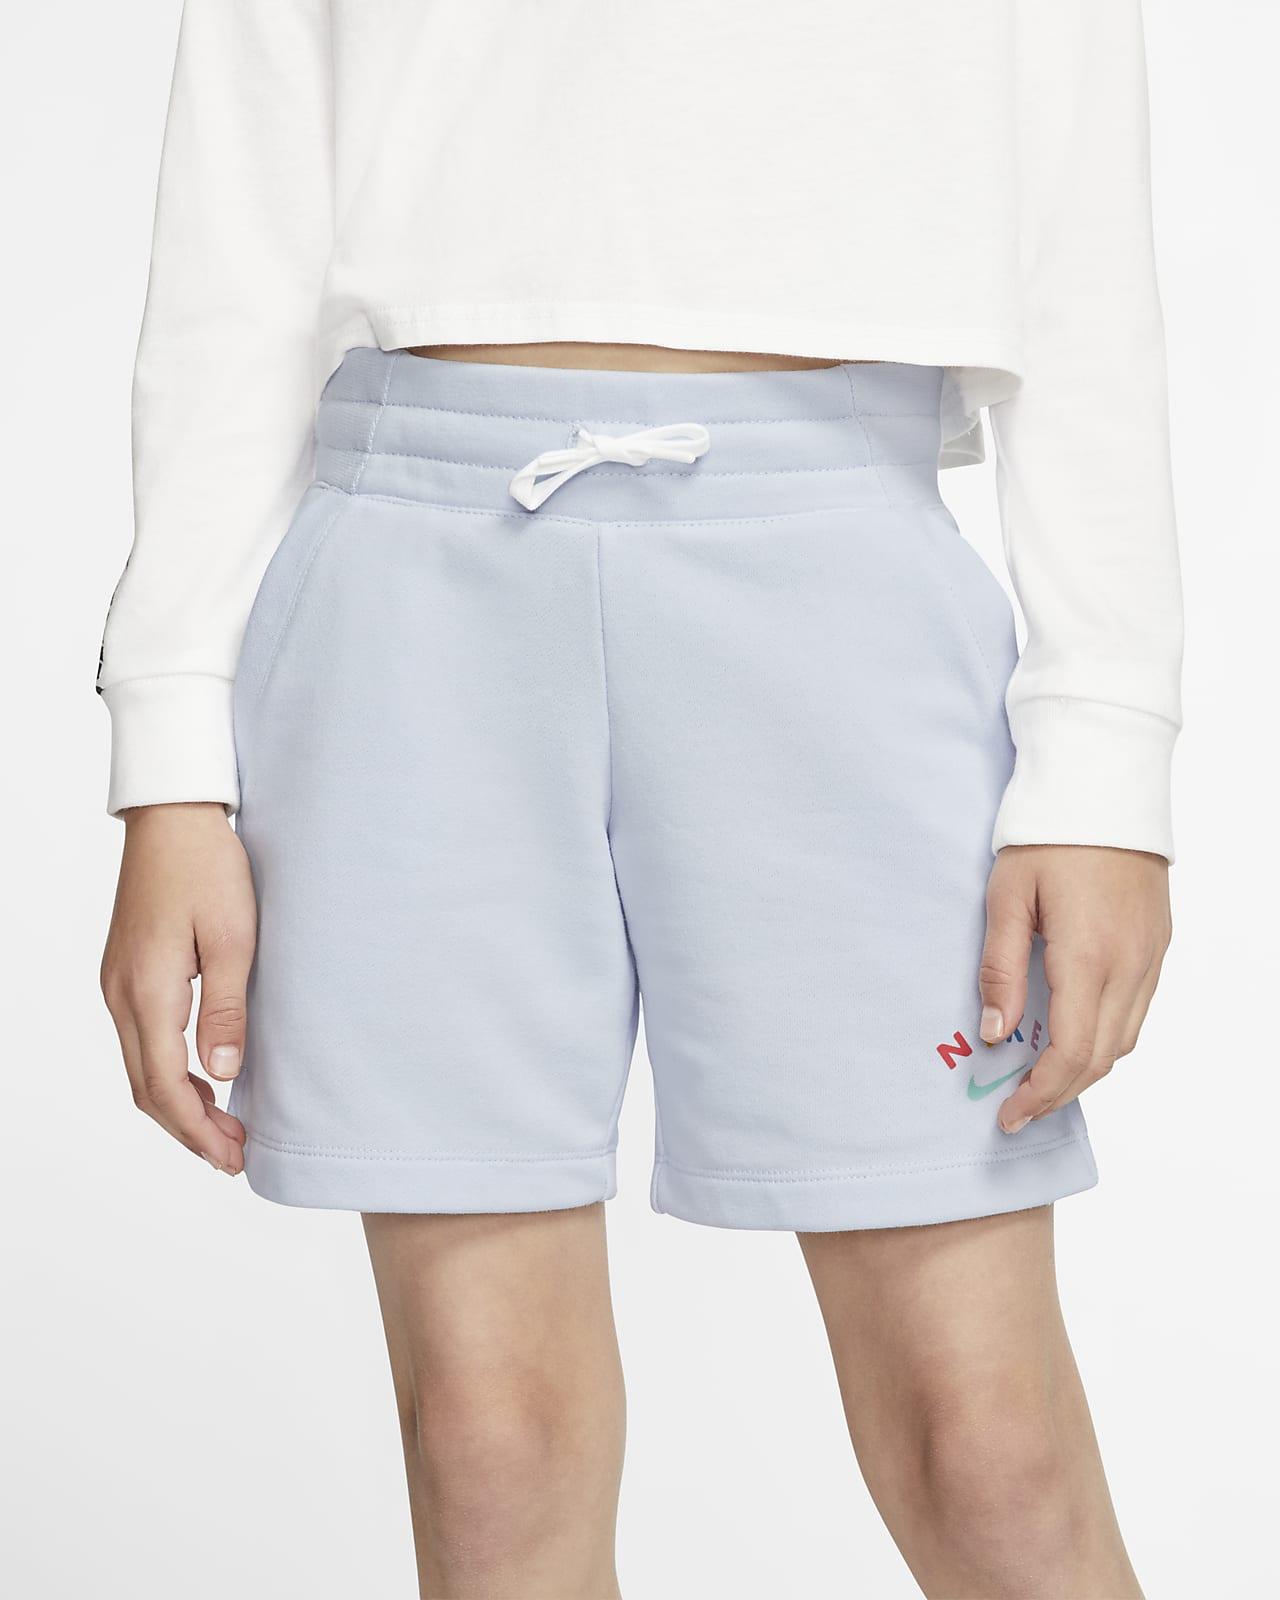 Nike Sportswear Older Kids' (Girls') Shorts. Nike VN